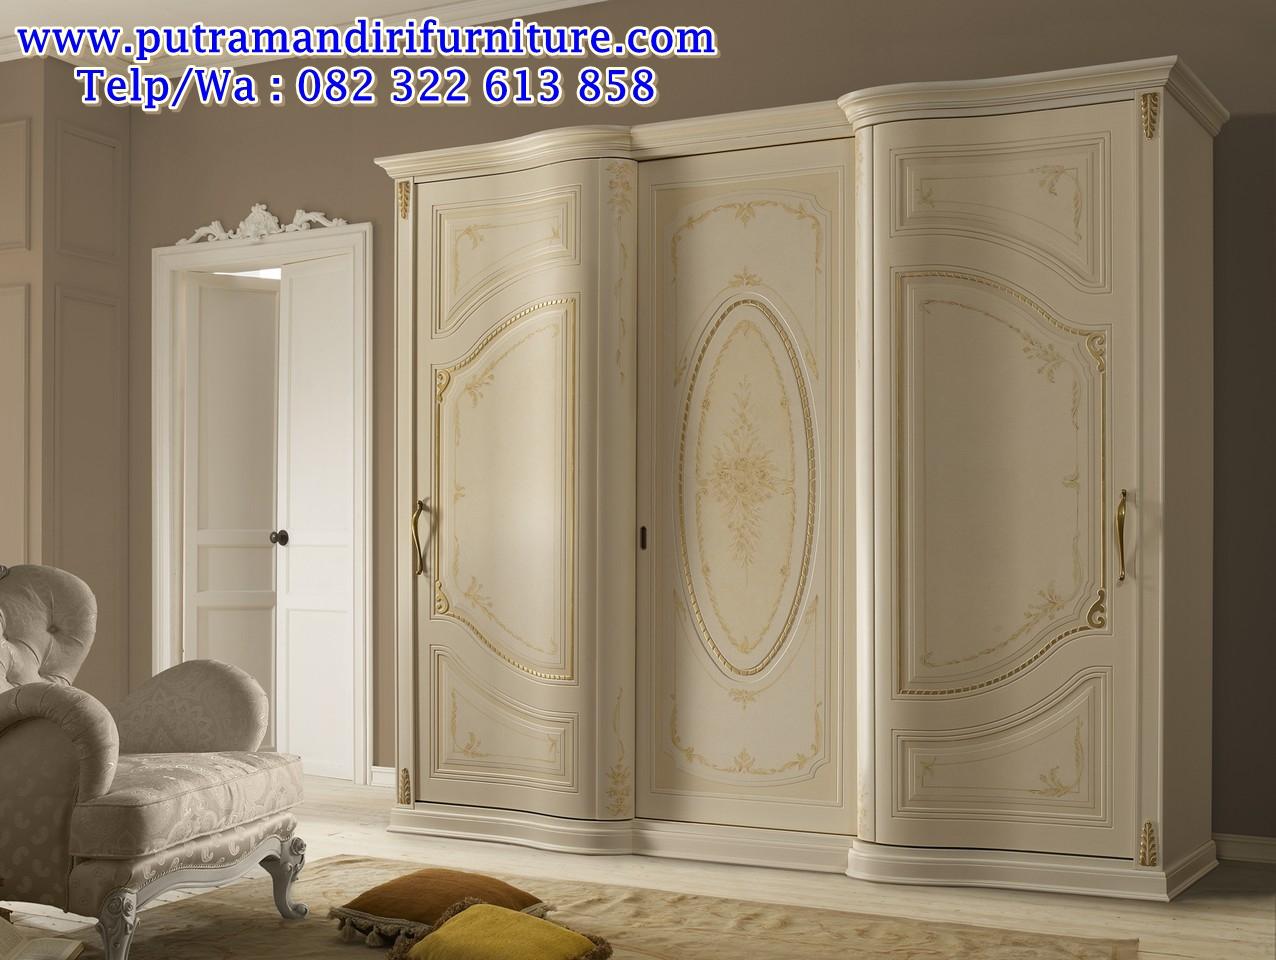 lemari 3 pintu model lengkung mewah modern